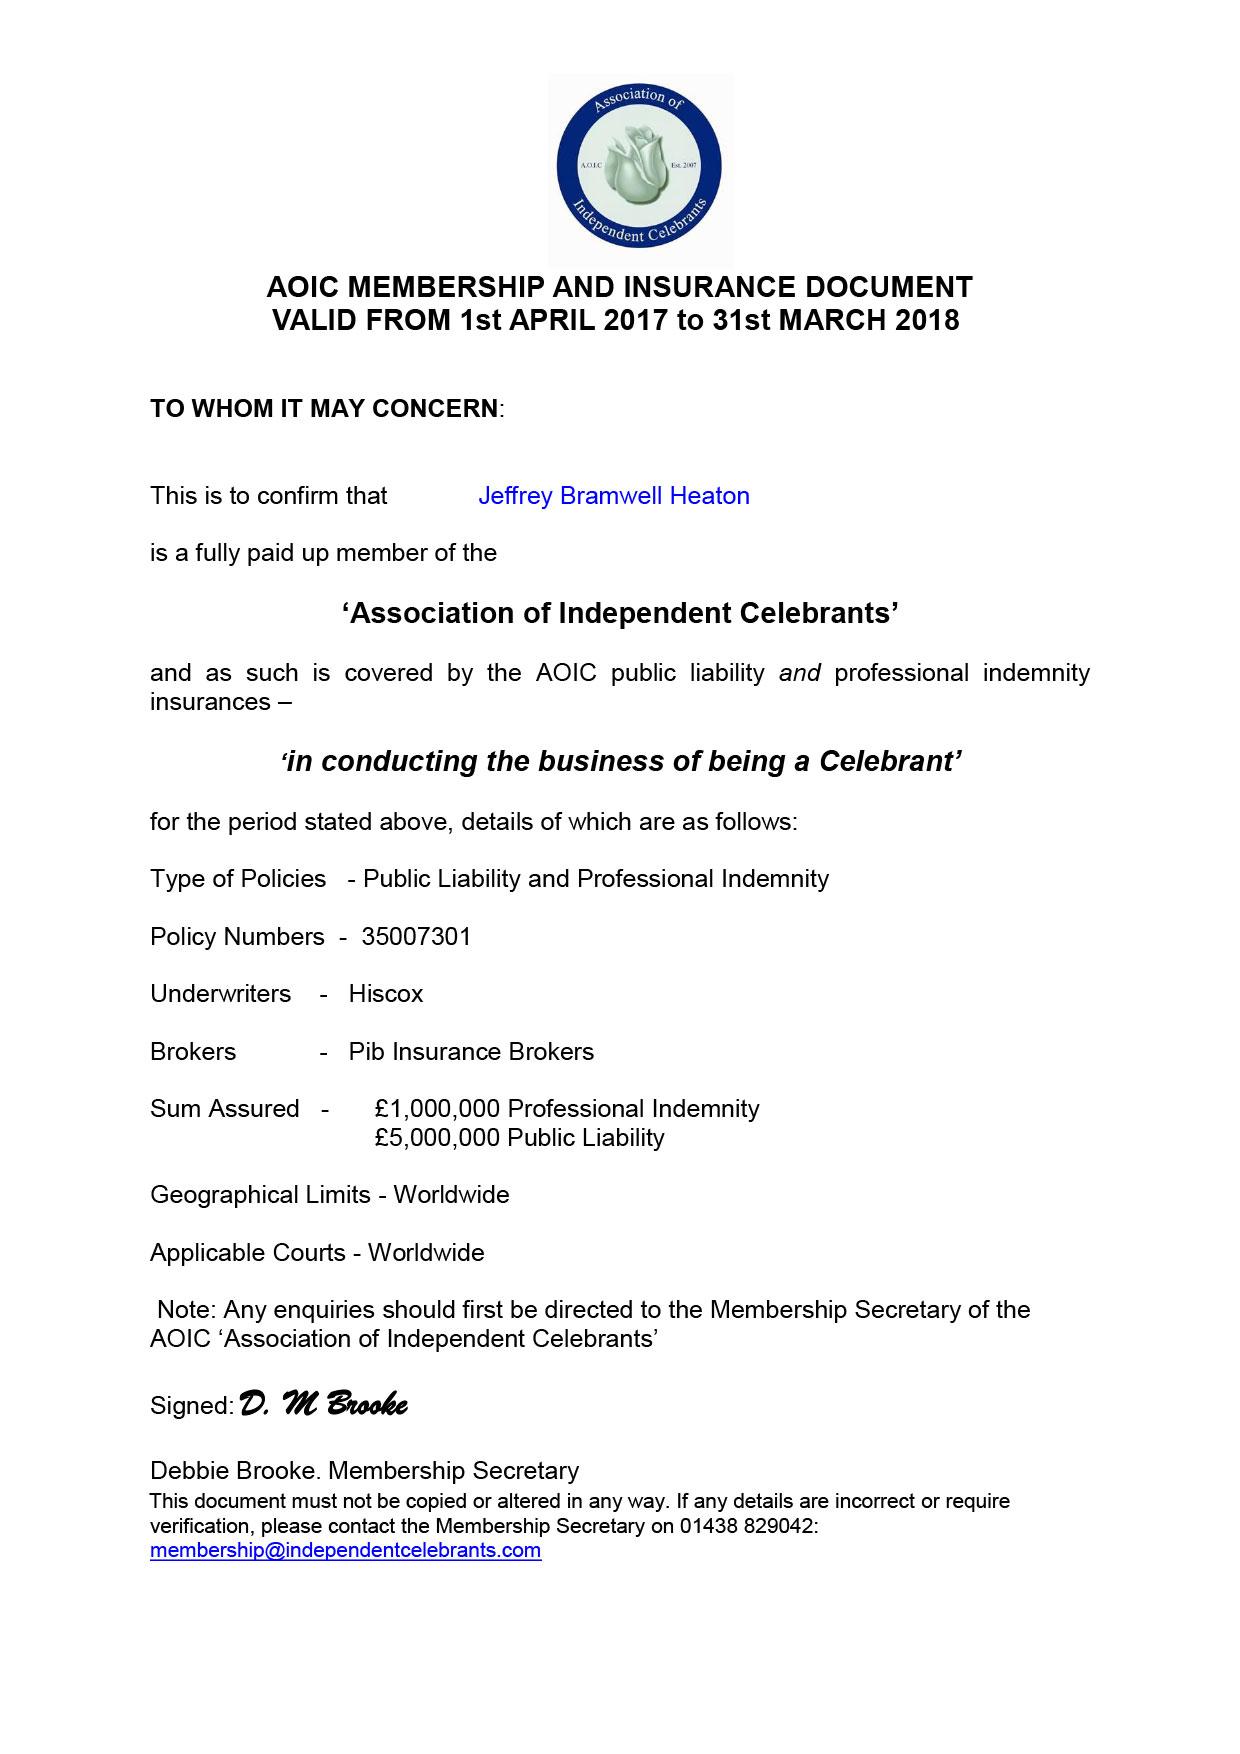 Jeff Heaton AOIC Certificate